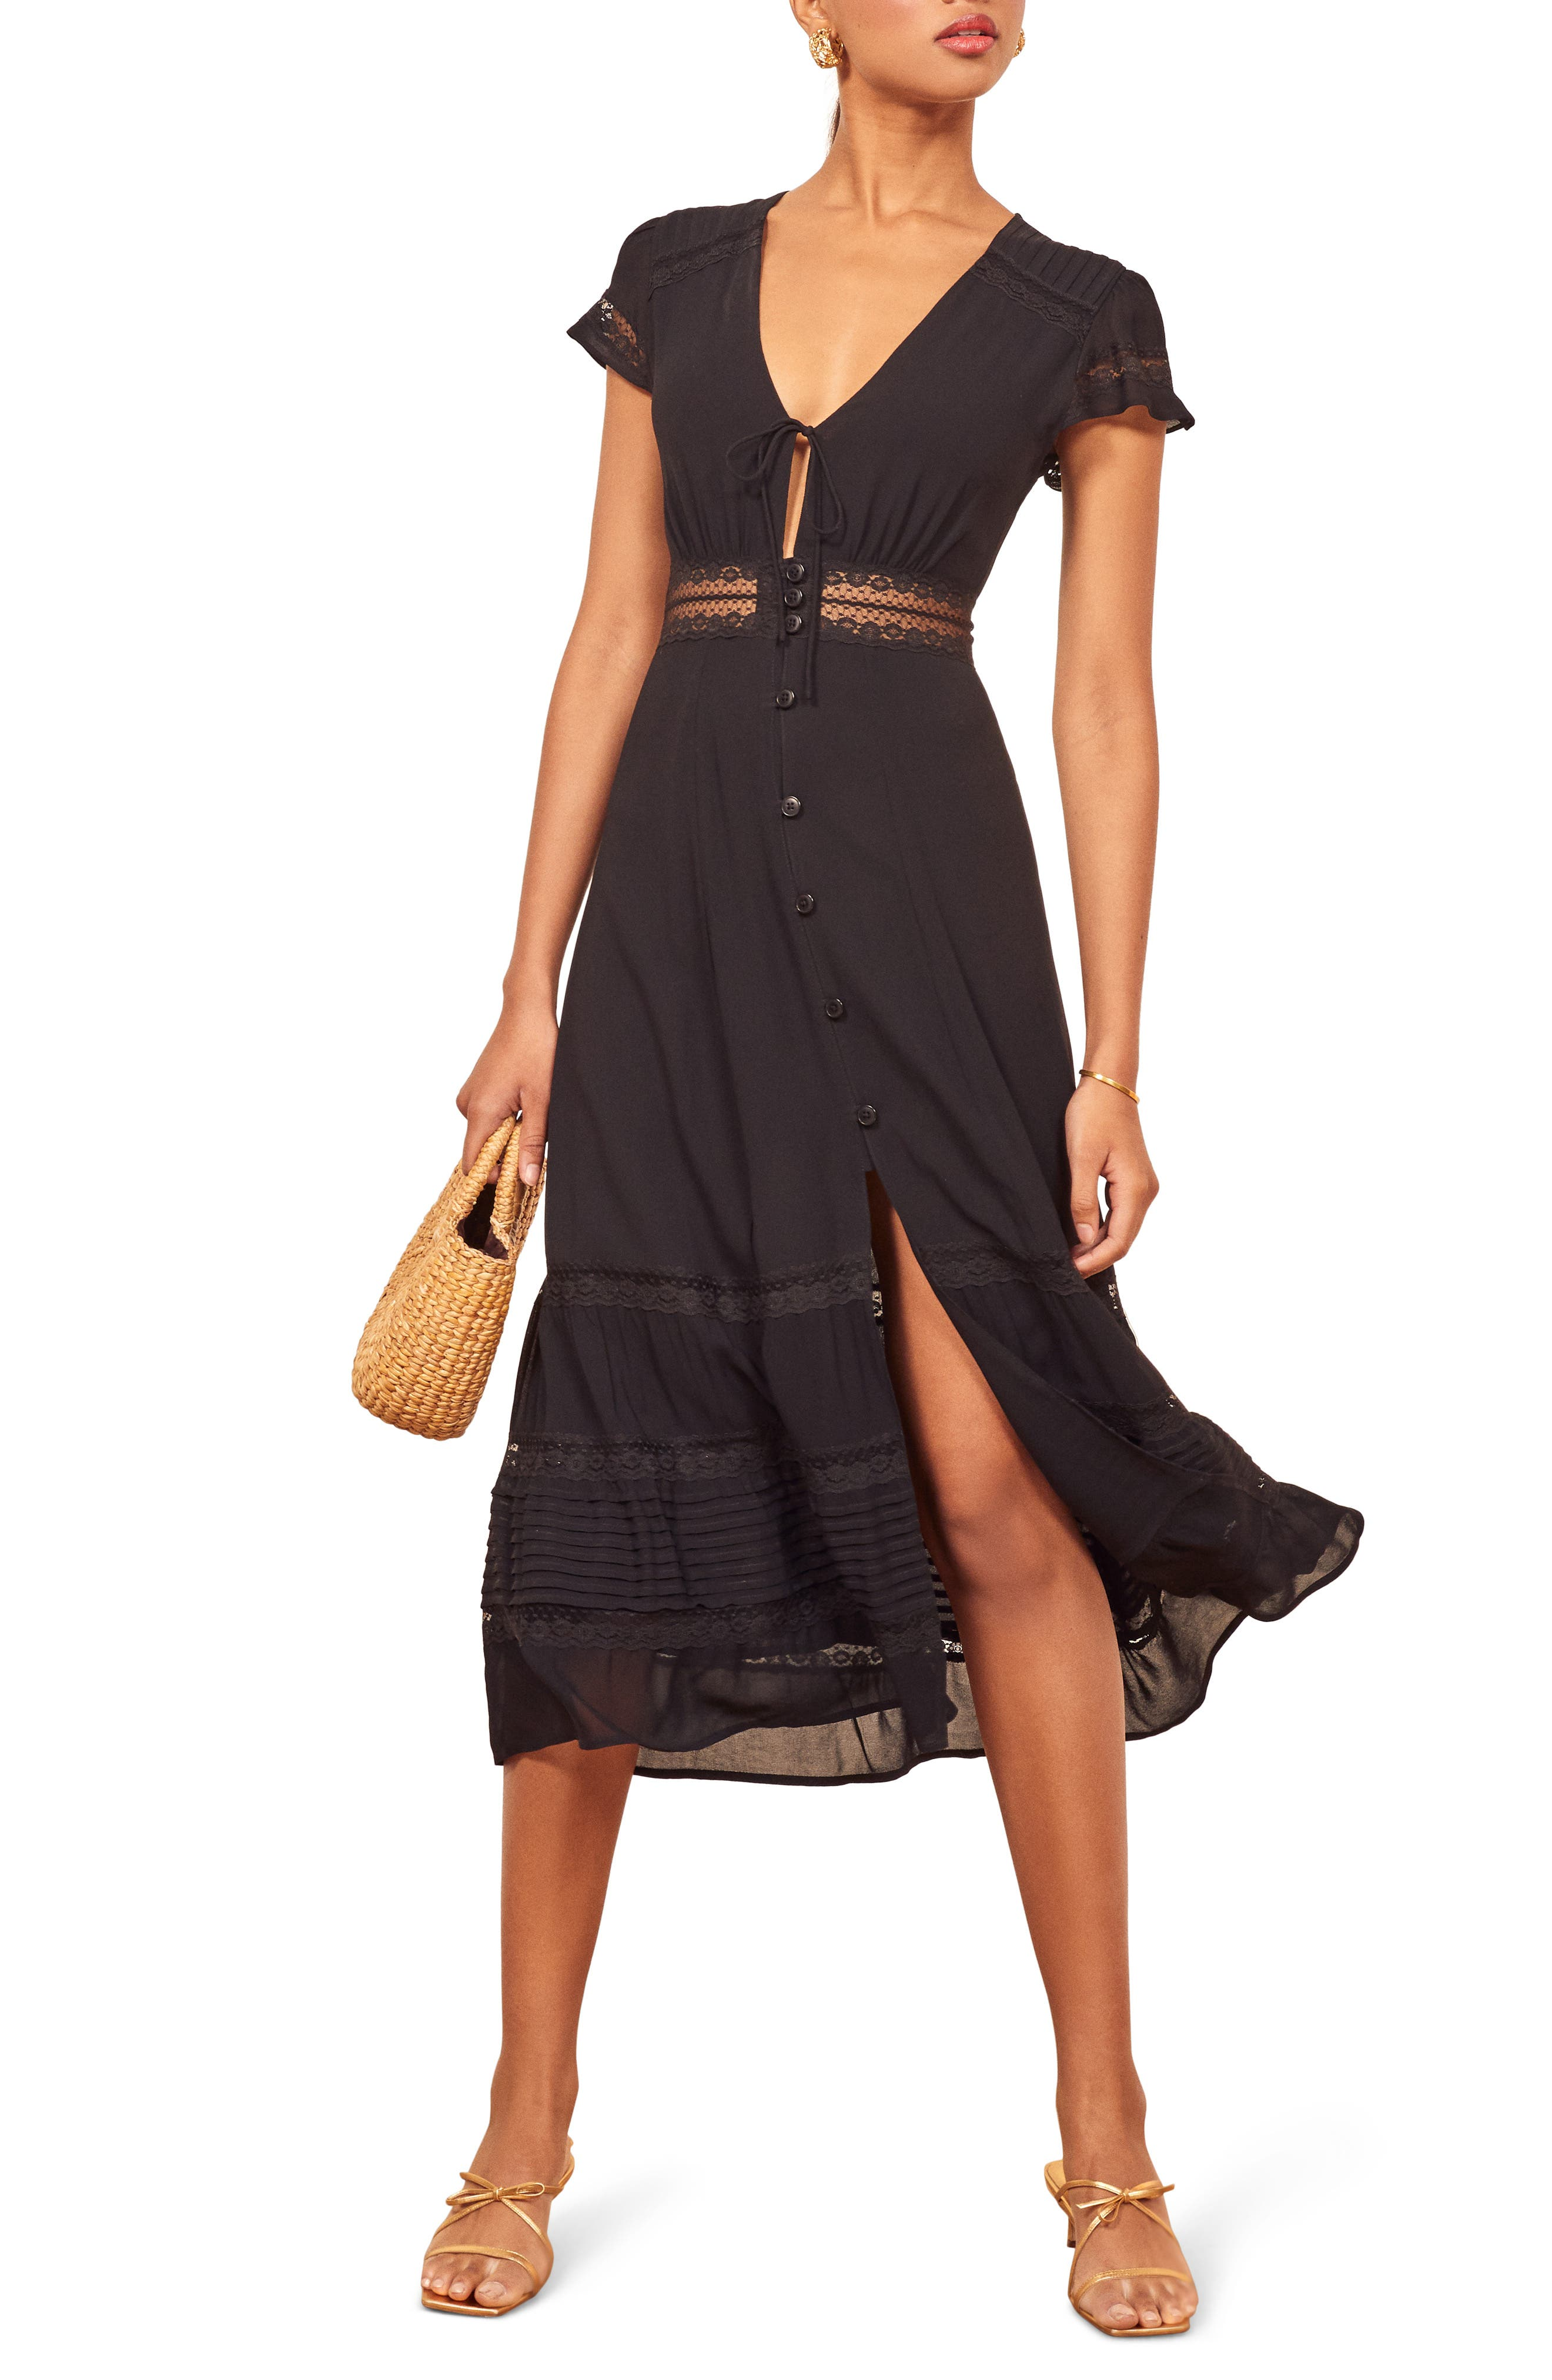 Reformation Garland Lace Trim Midi Dress, Black